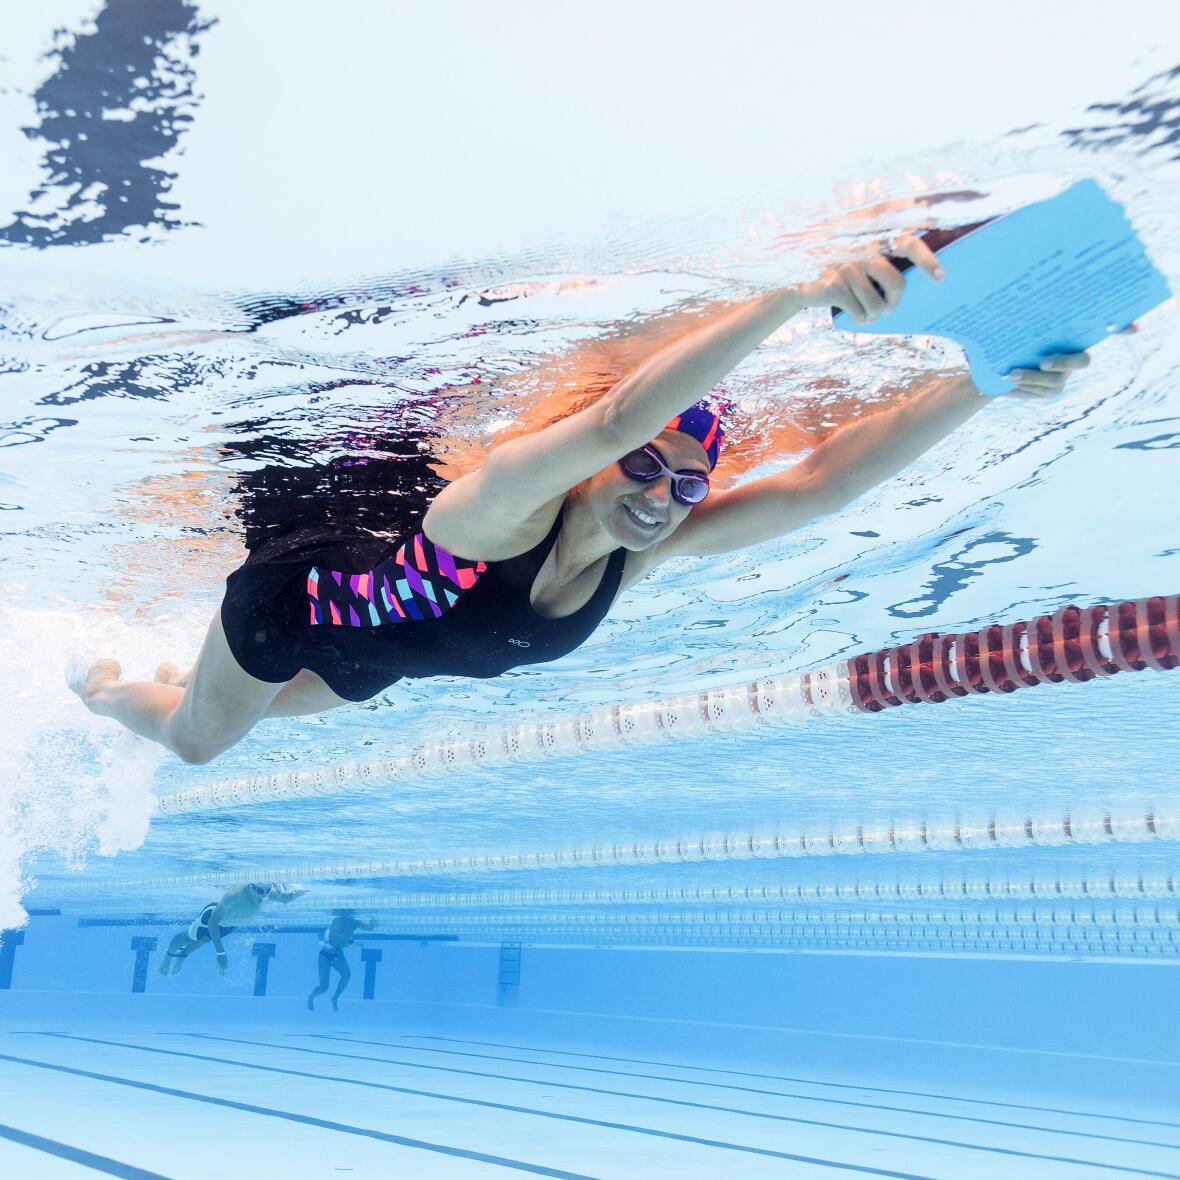 natation-top-5-des-exercices-pour-muscler-vos-bras